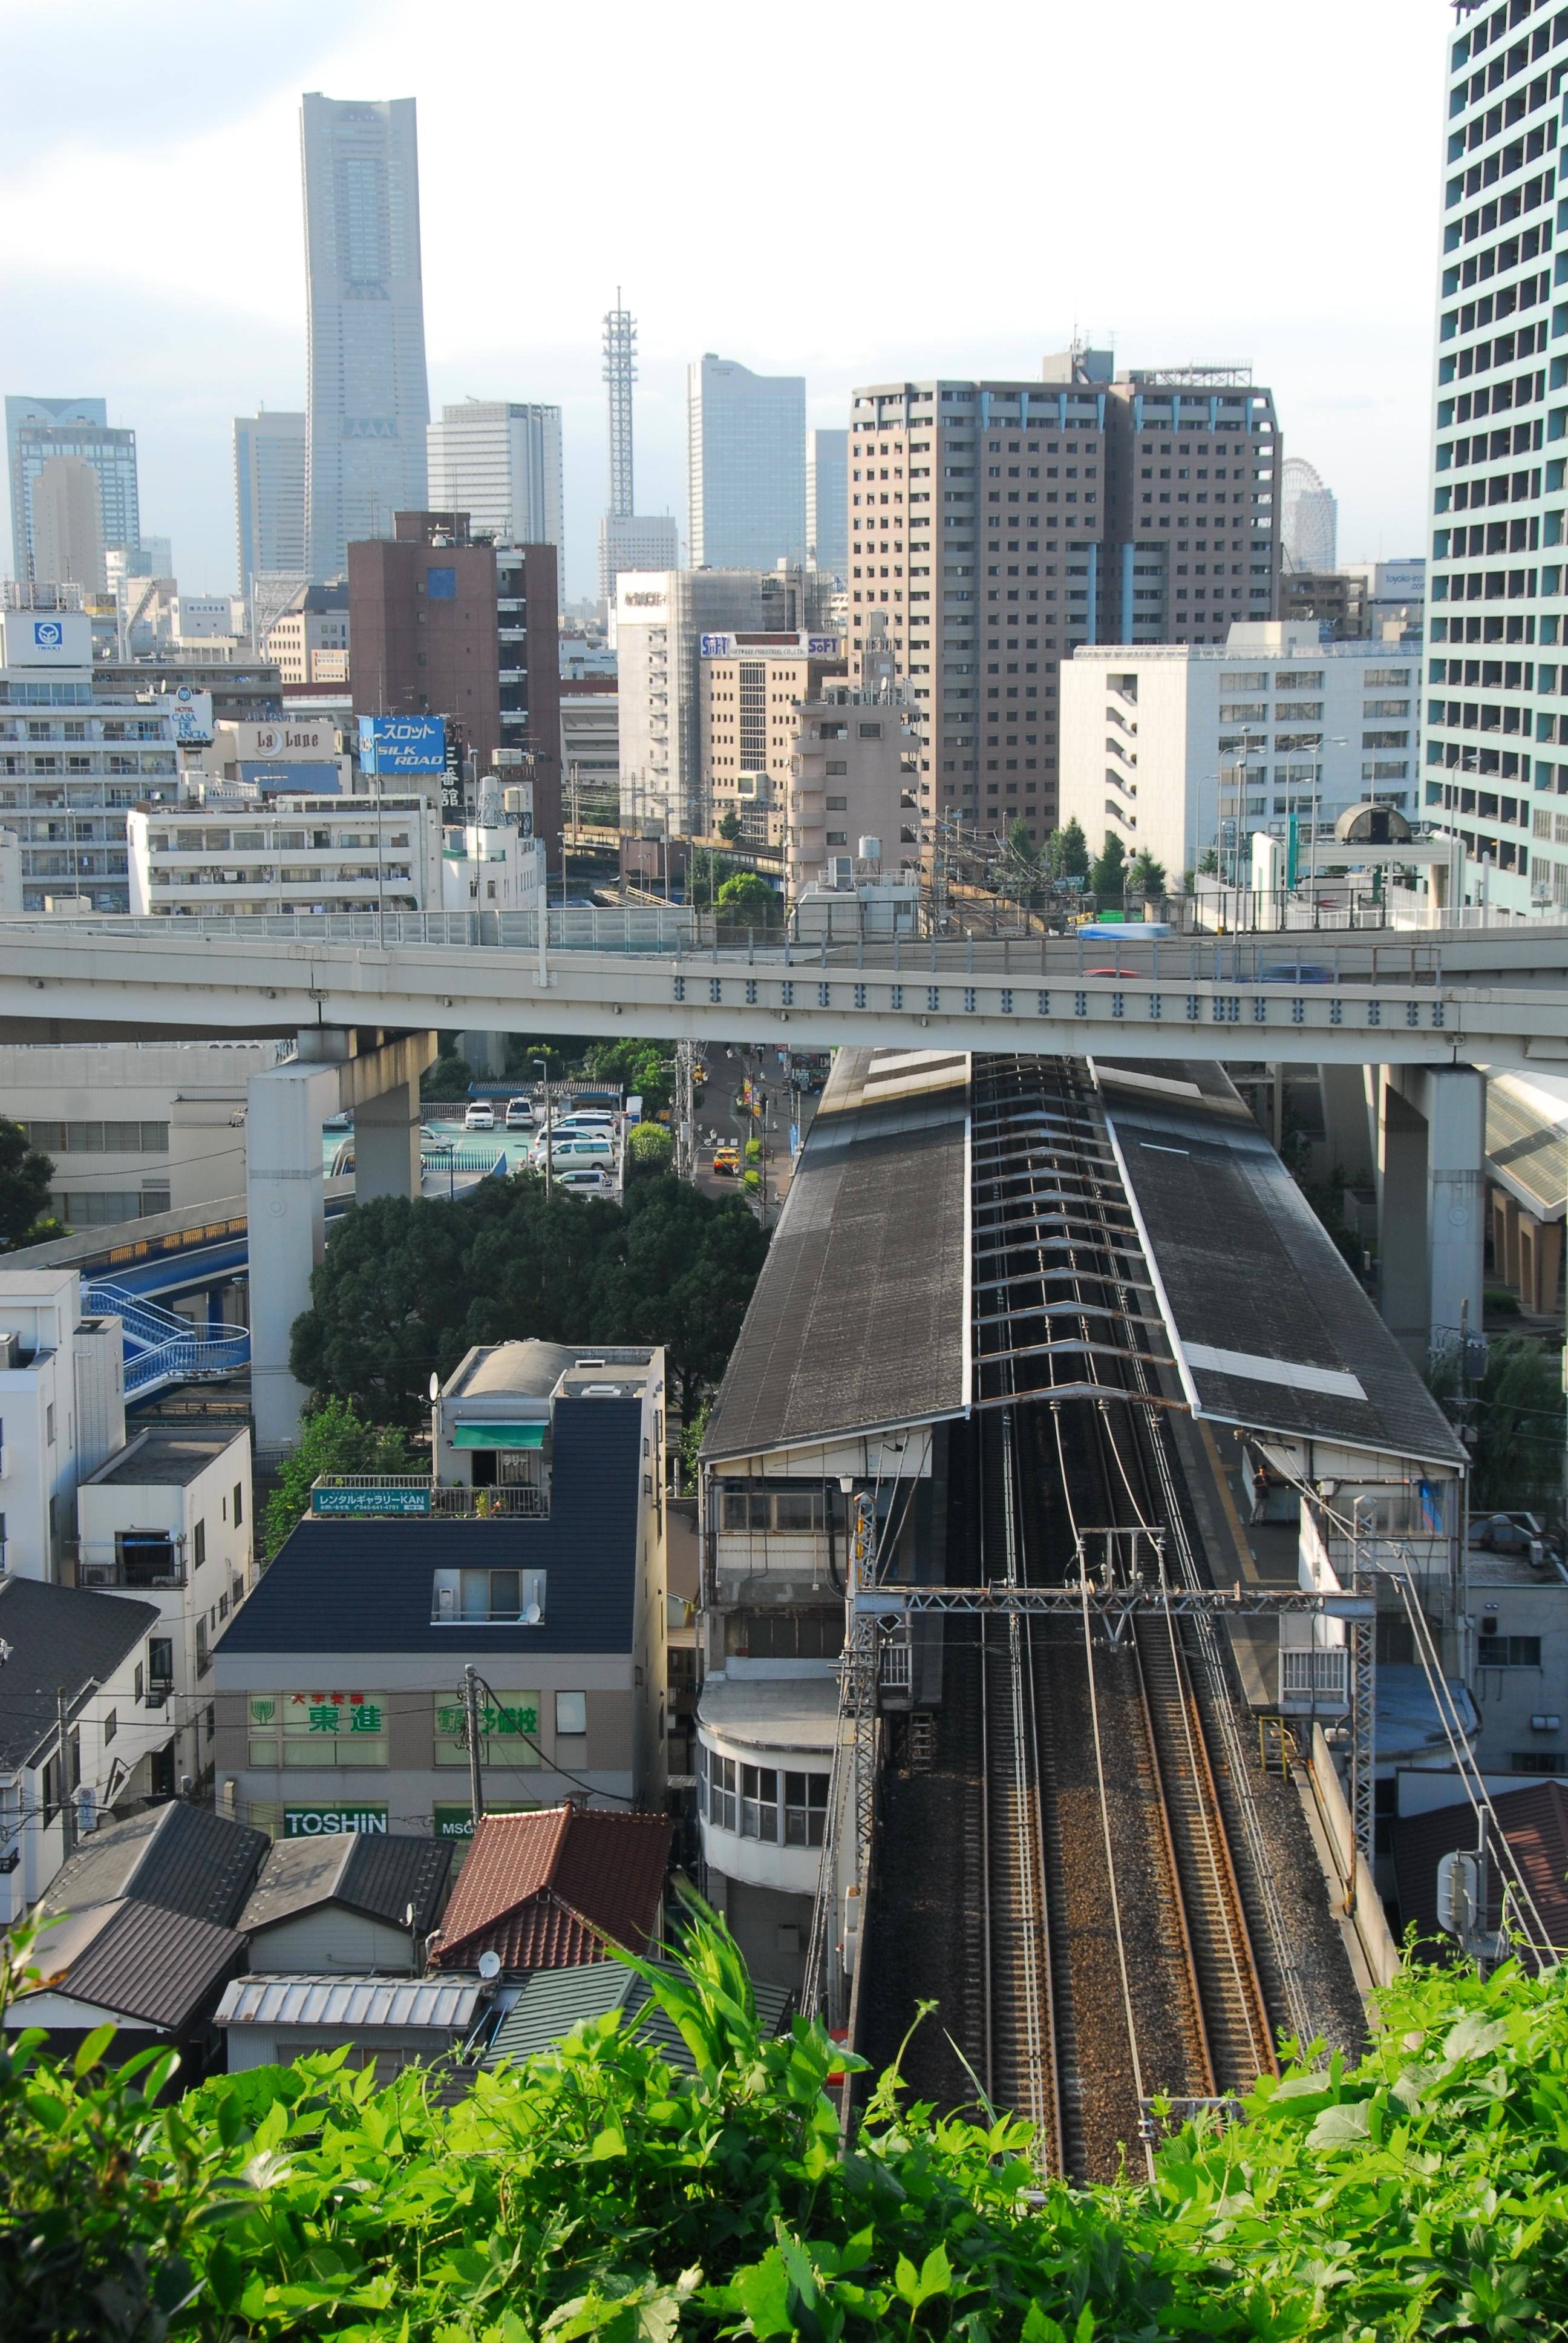 https://upload.wikimedia.org/wikipedia/commons/f/fd/Ishikawacho_Station.jpg